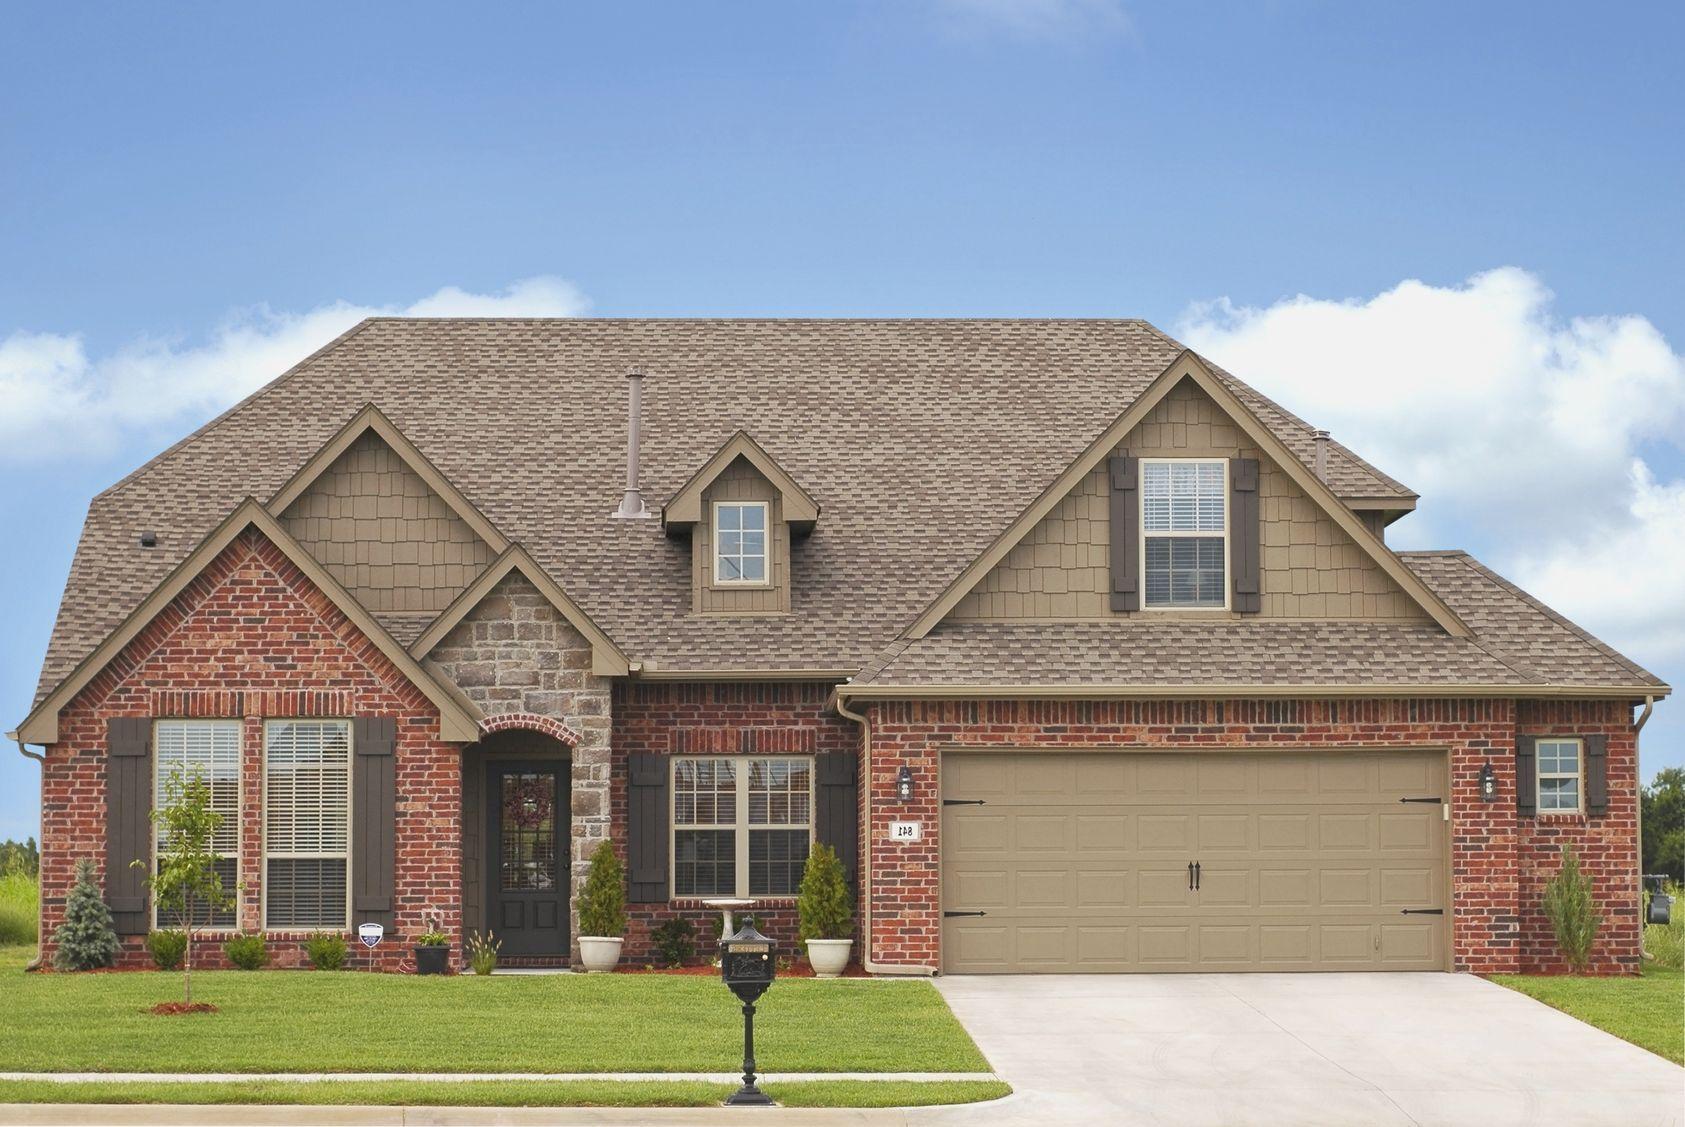 paint brick house grey exterior trim colors on red house exteriors rh pinterest com